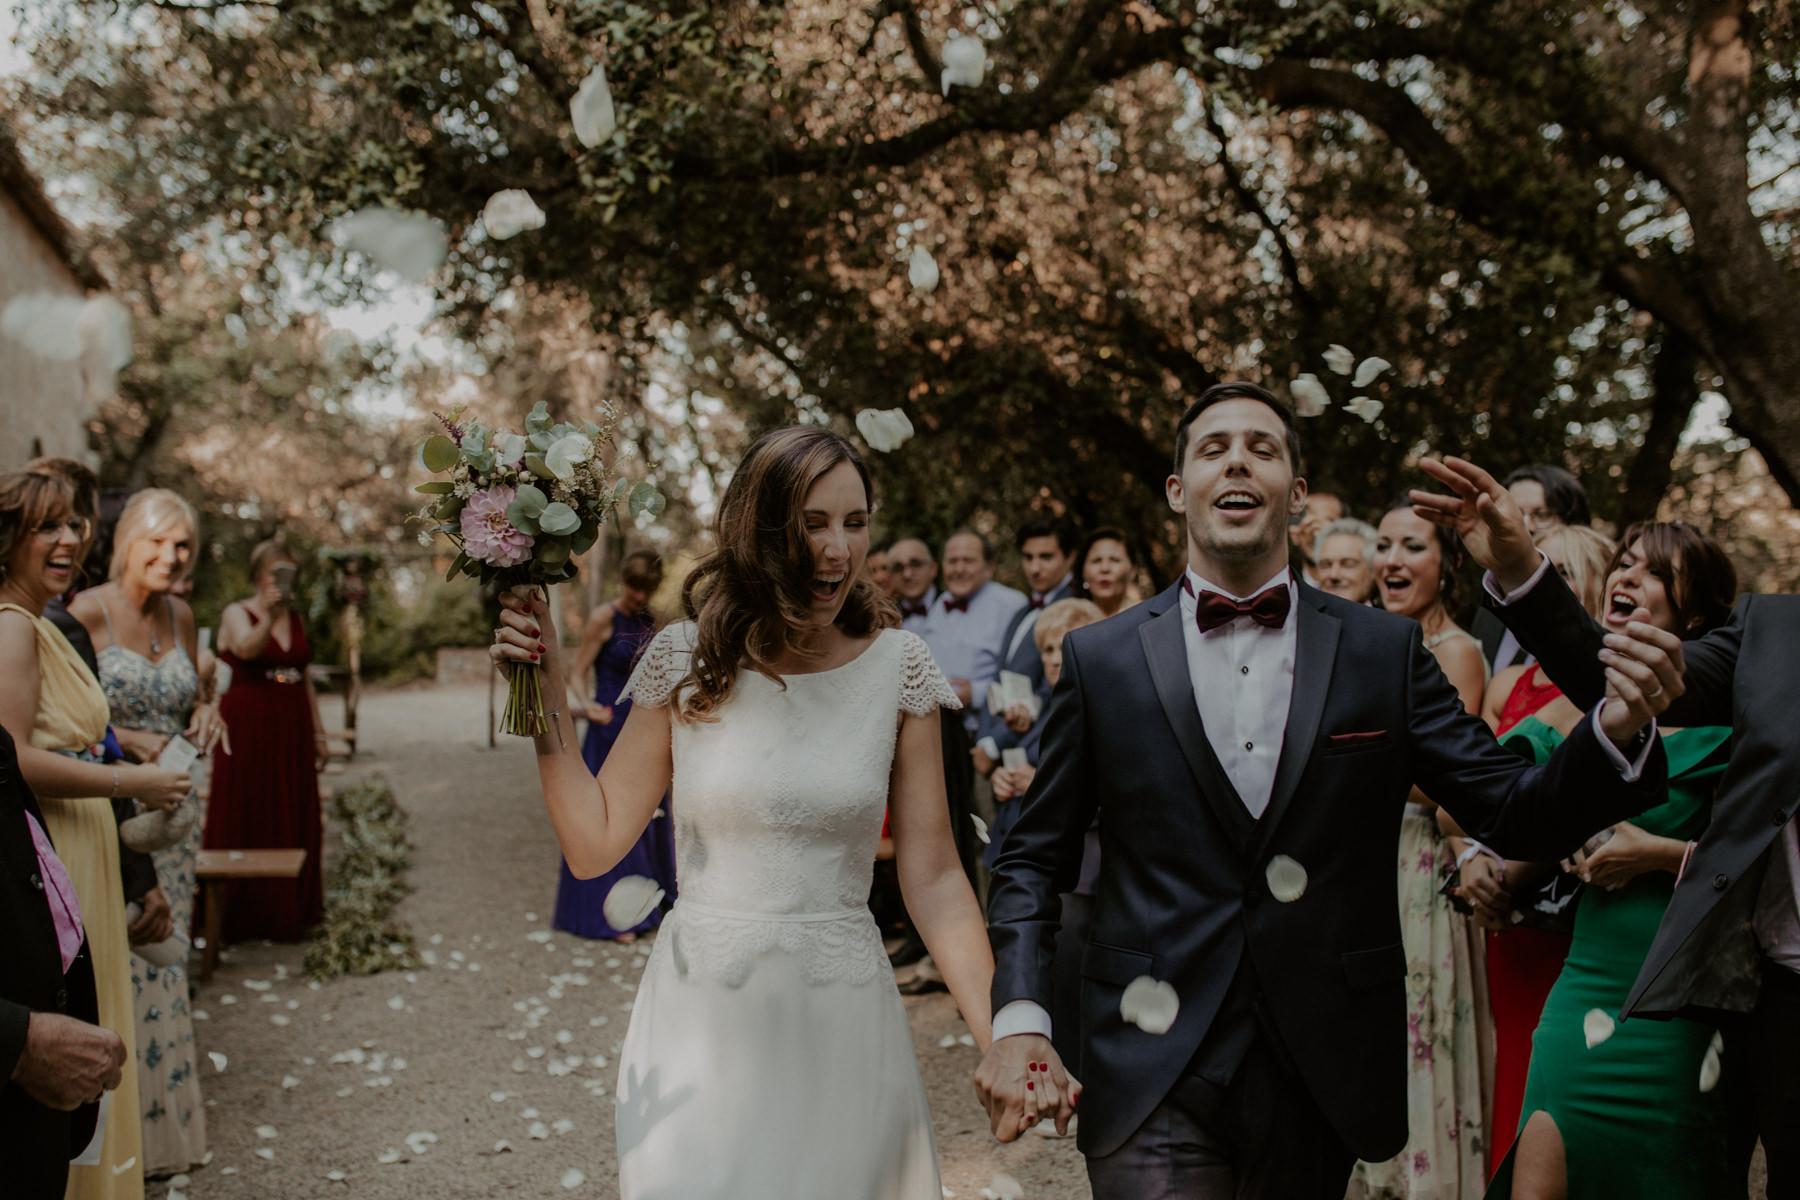 alt_thenortherngirlphotography_couples_weddingphotographer_photographer_wedding_boda_fotografodebodas_fotografobodasbarcelona_bodaindie_bodasconestilo_bodaensantperedeclara_jennifermiguel-406.jpg